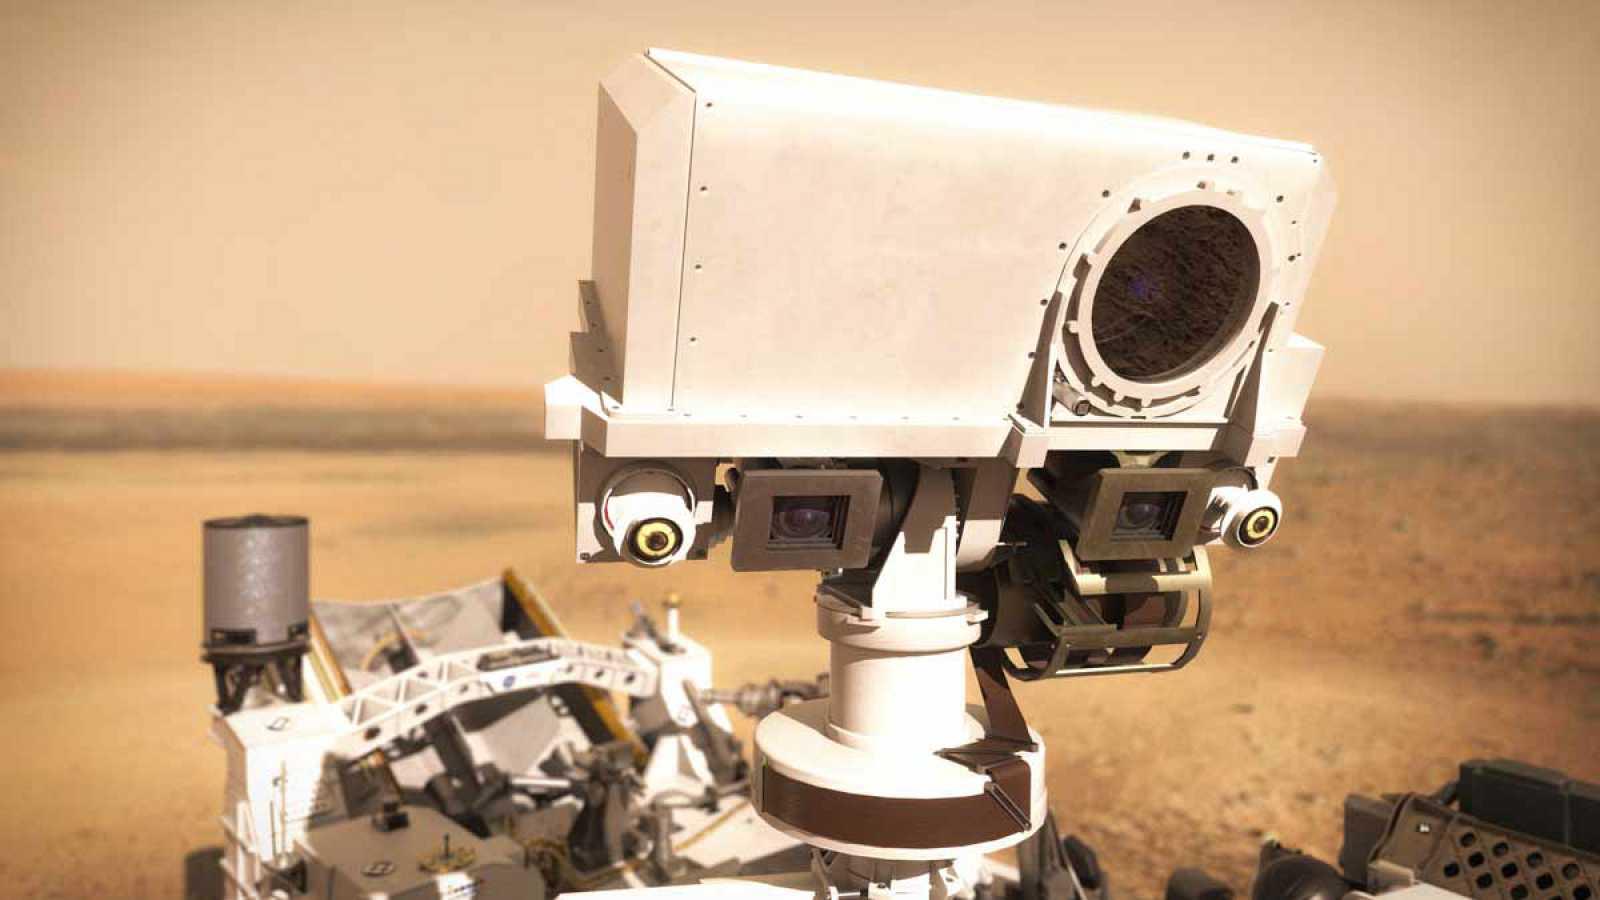 Marca España - España llega a Marte a través de dos instrumentos en el Perseverance - 23/02/21 - escuchar ahora